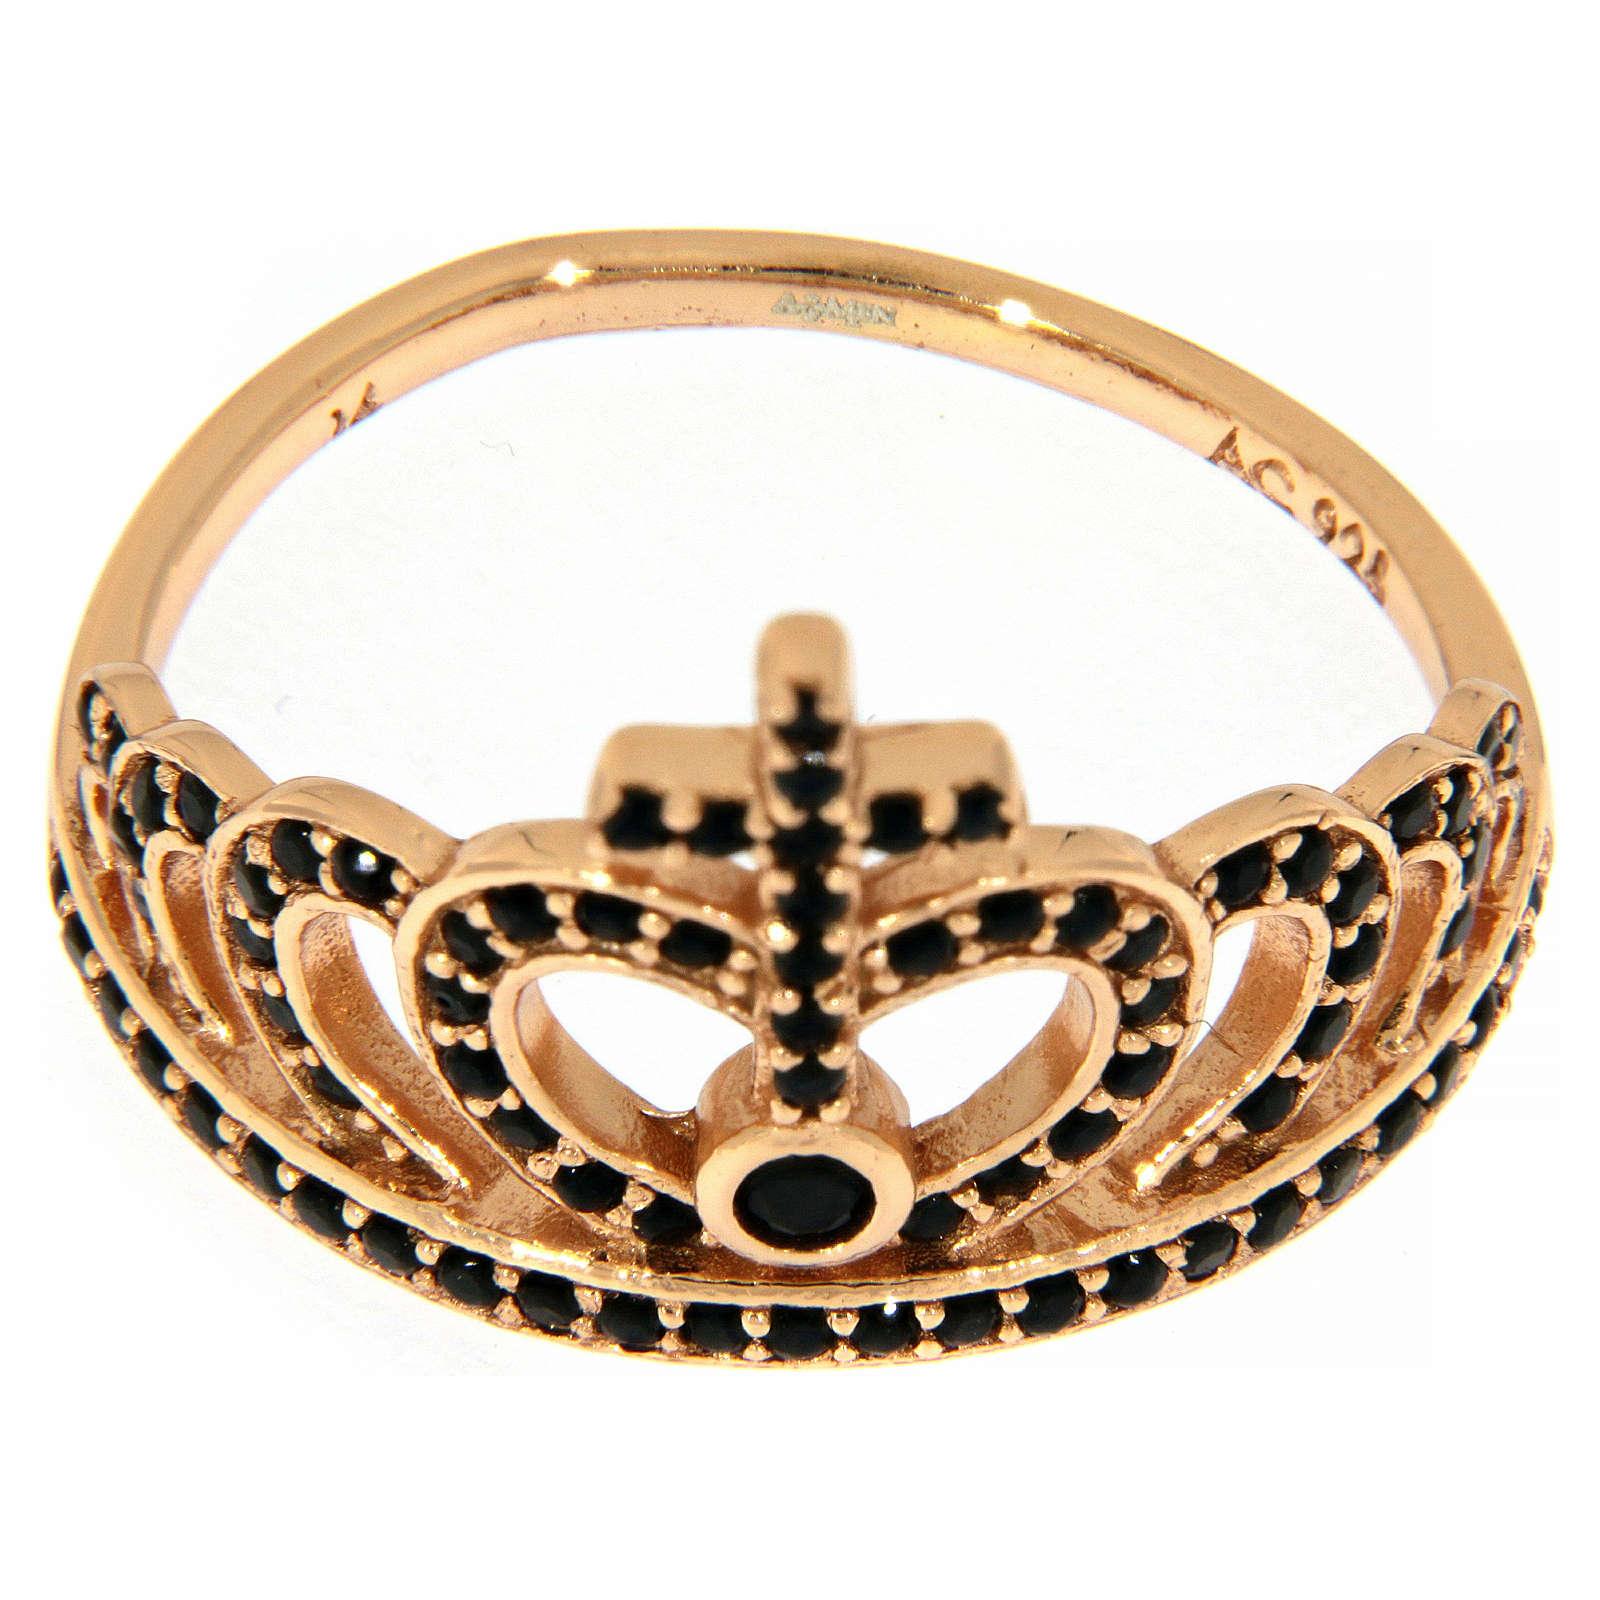 Anillo AMEN plata 925 rosada corona zircones negros 3